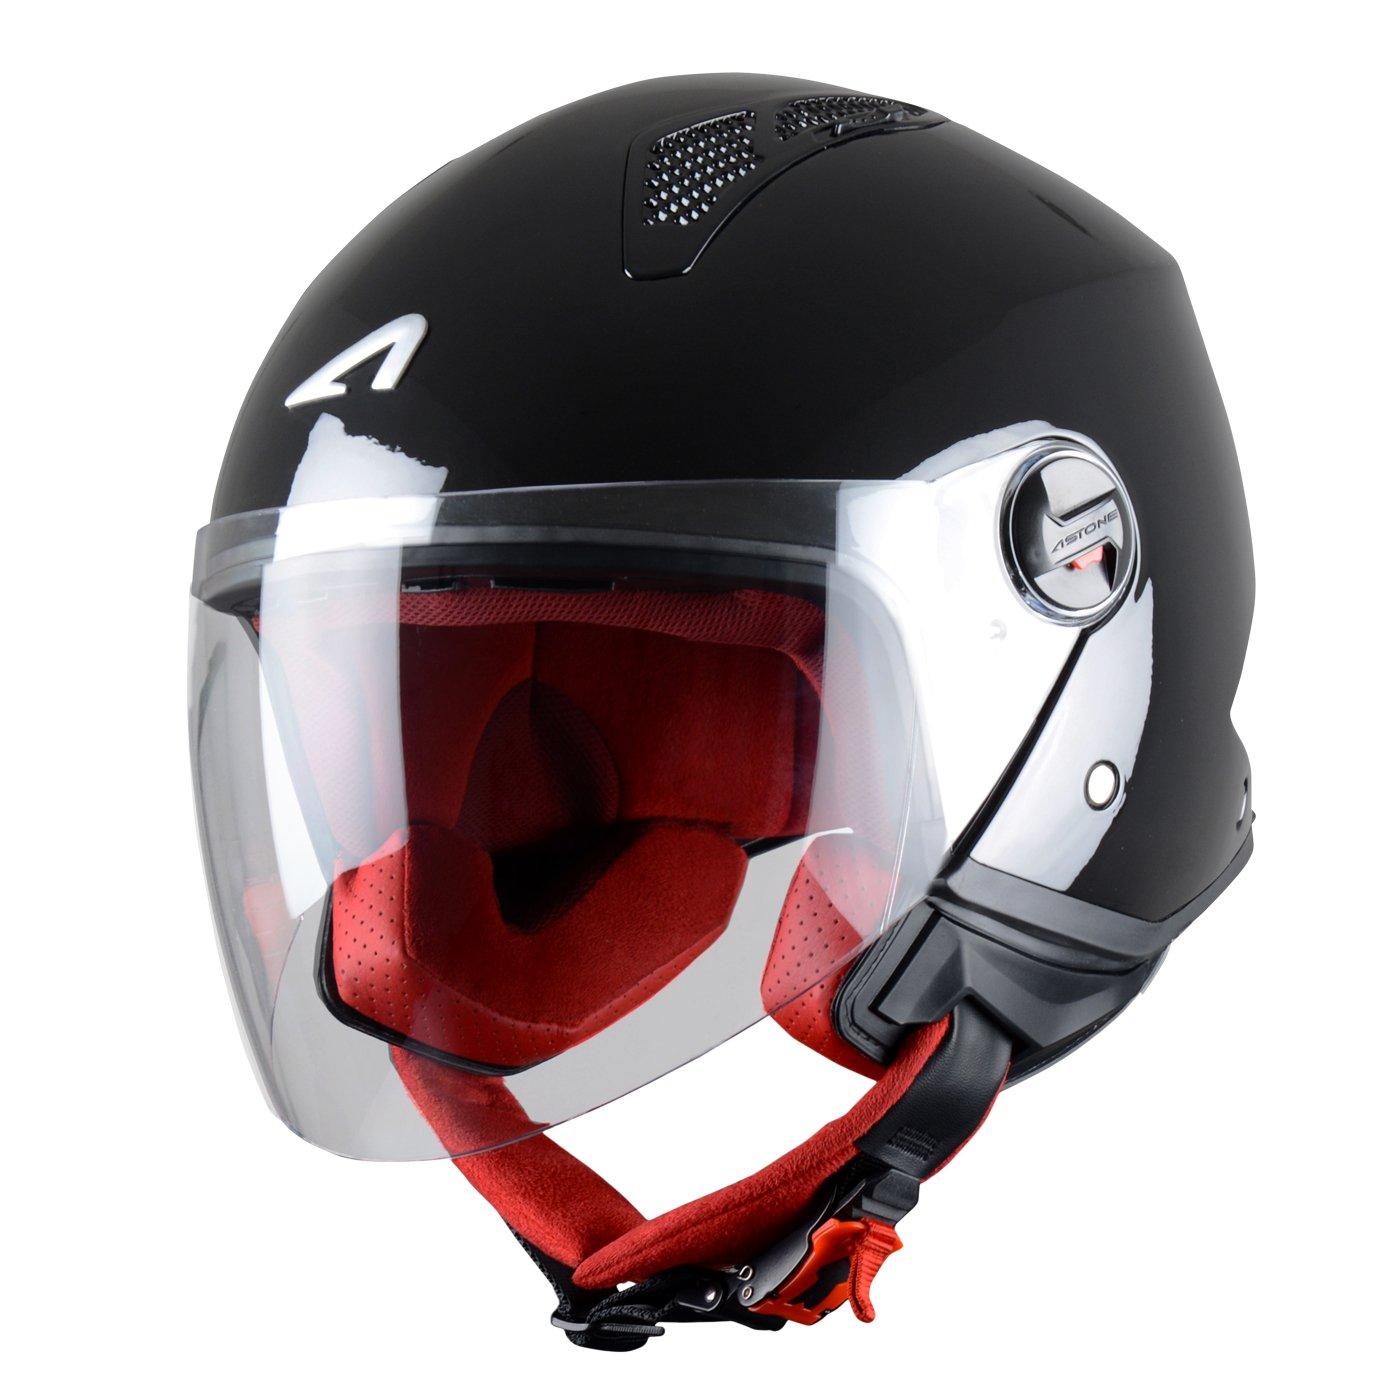 color Beige Desert talla M Astone Helmets Mini Jet Army Casco Jet